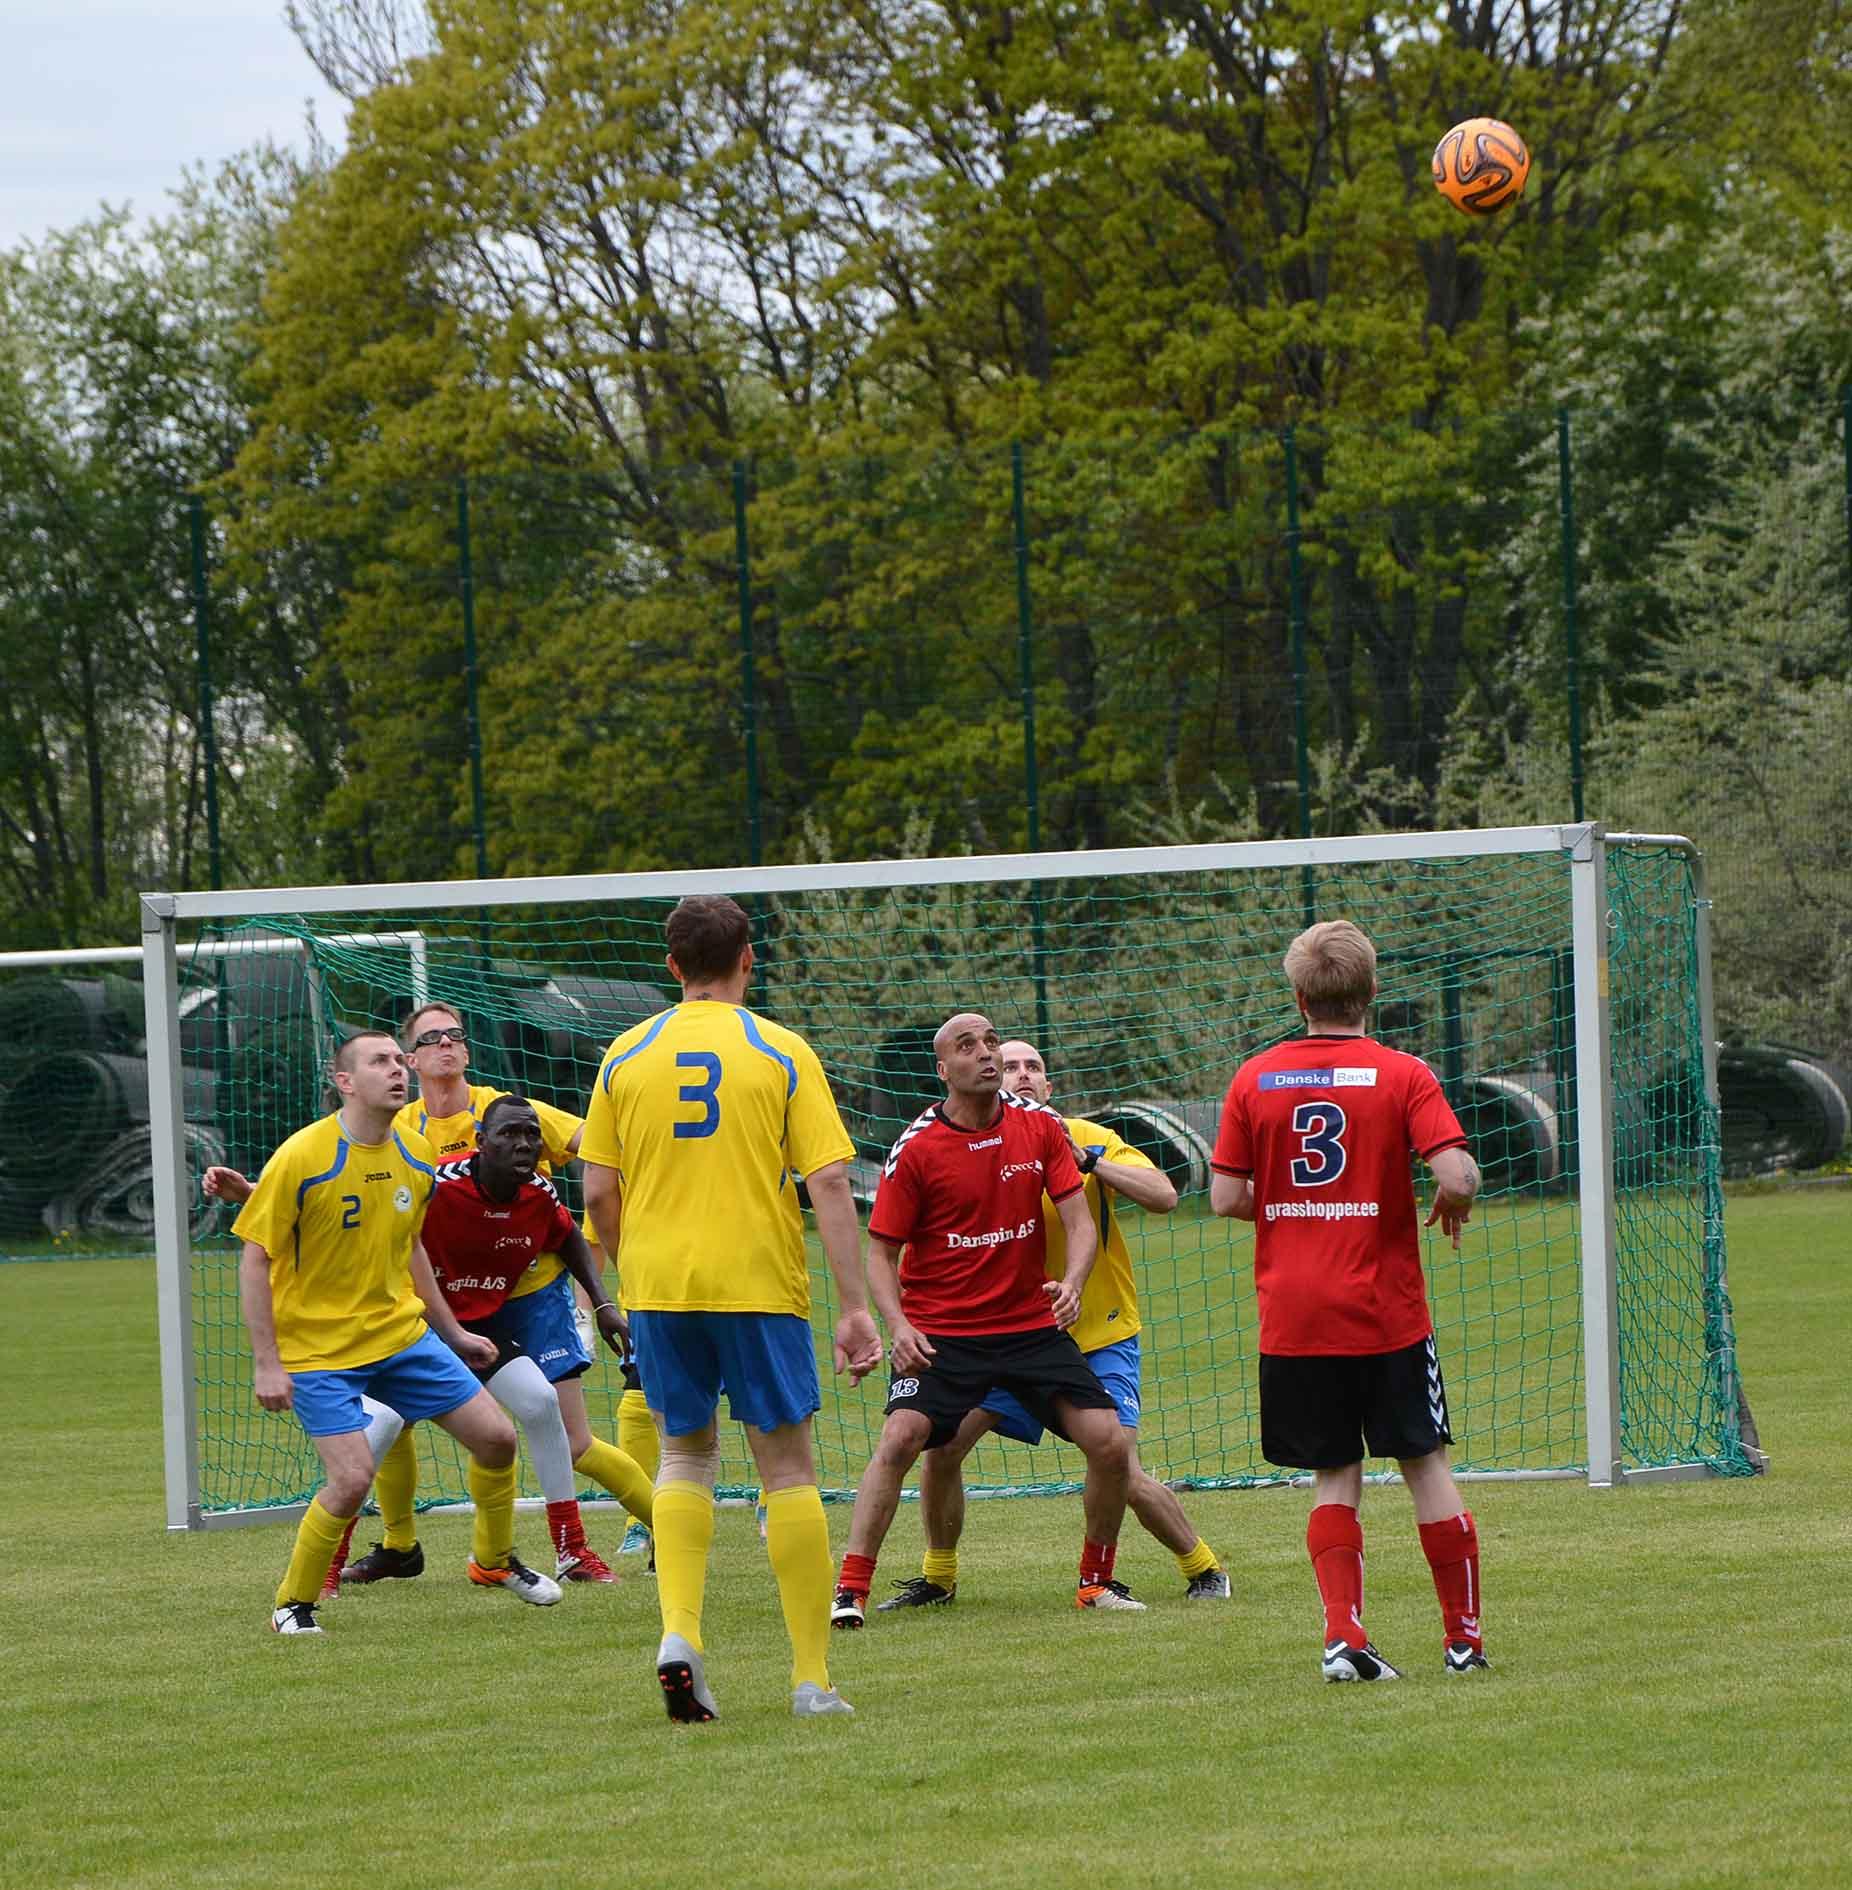 2017.05.27 Football tournament (8)